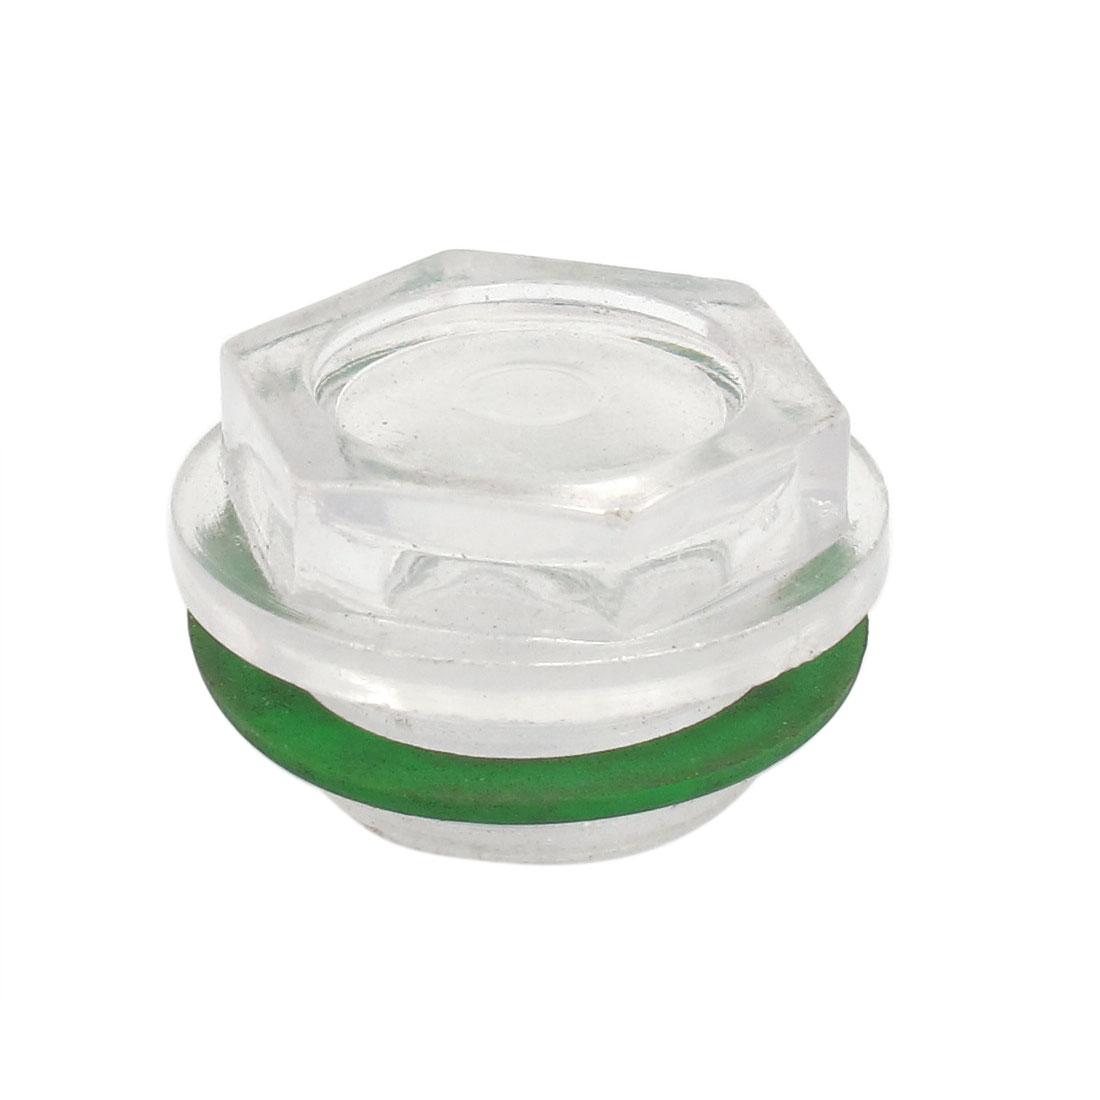 25mm Thread Dia Liquid Oil Level Sight Glass Green for Air Compressor